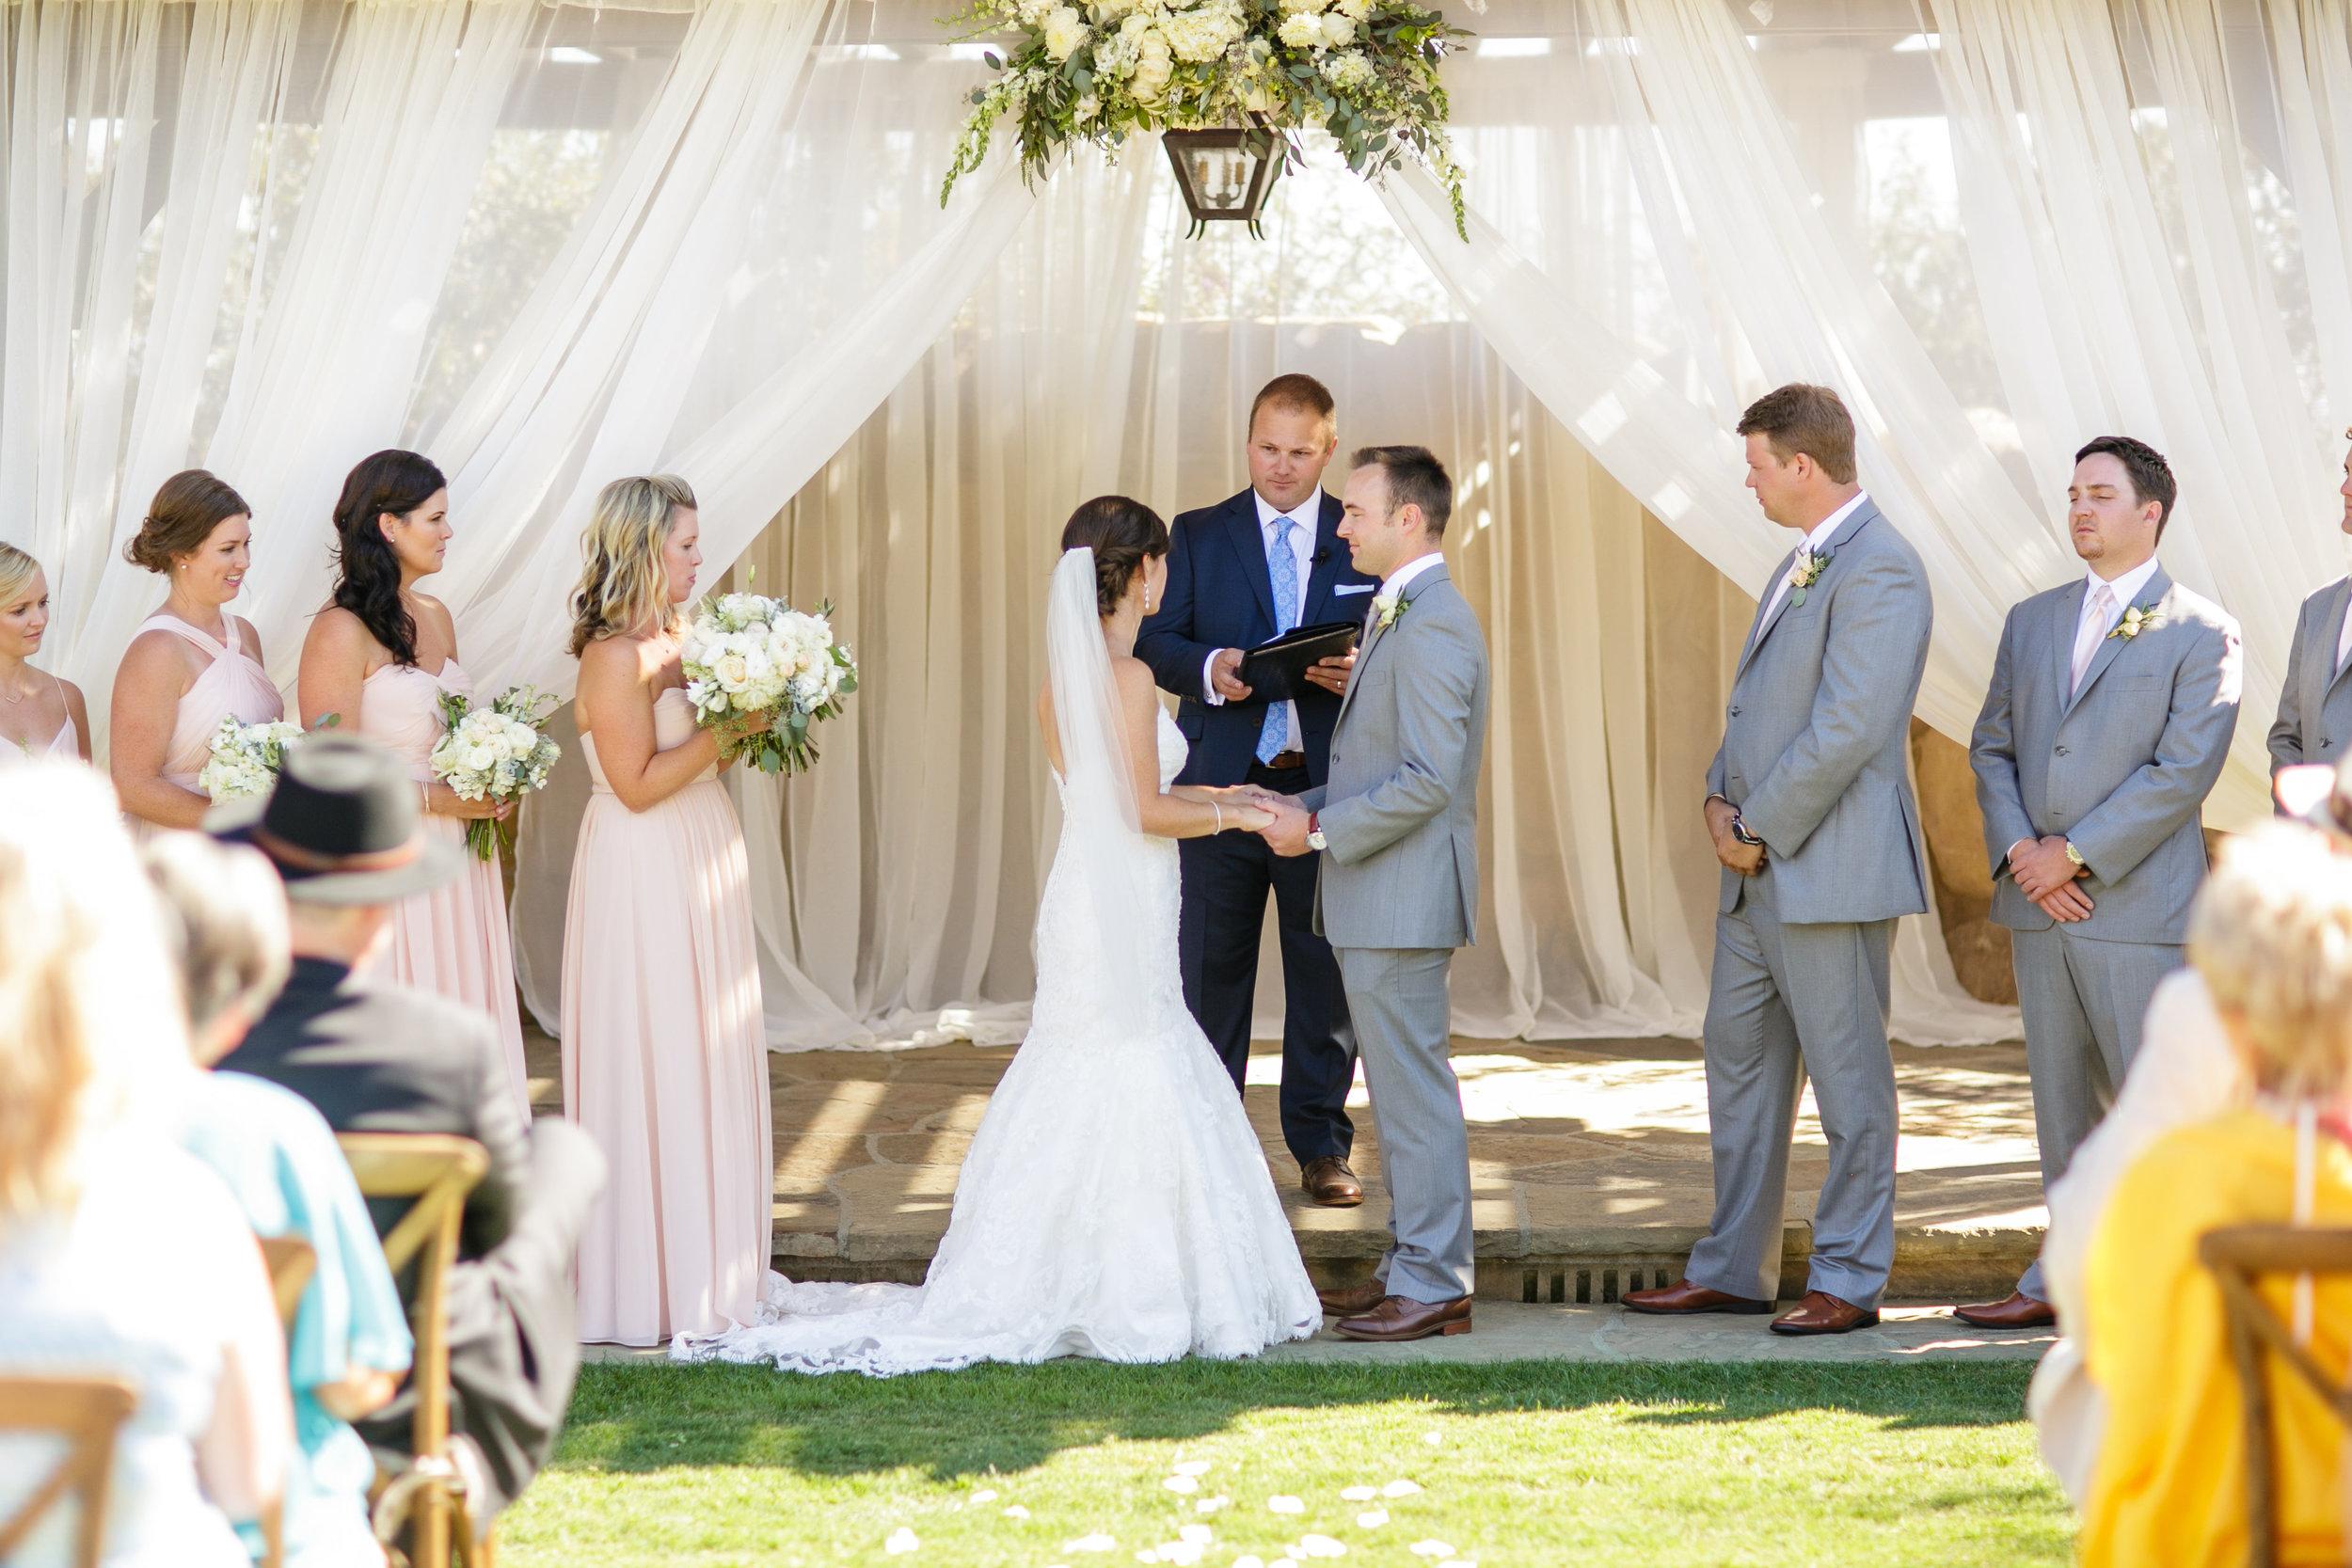 santabarbarawedding.com | Photo: Mary Jane Photography | Heartstone Ranch Private Estate Wedding